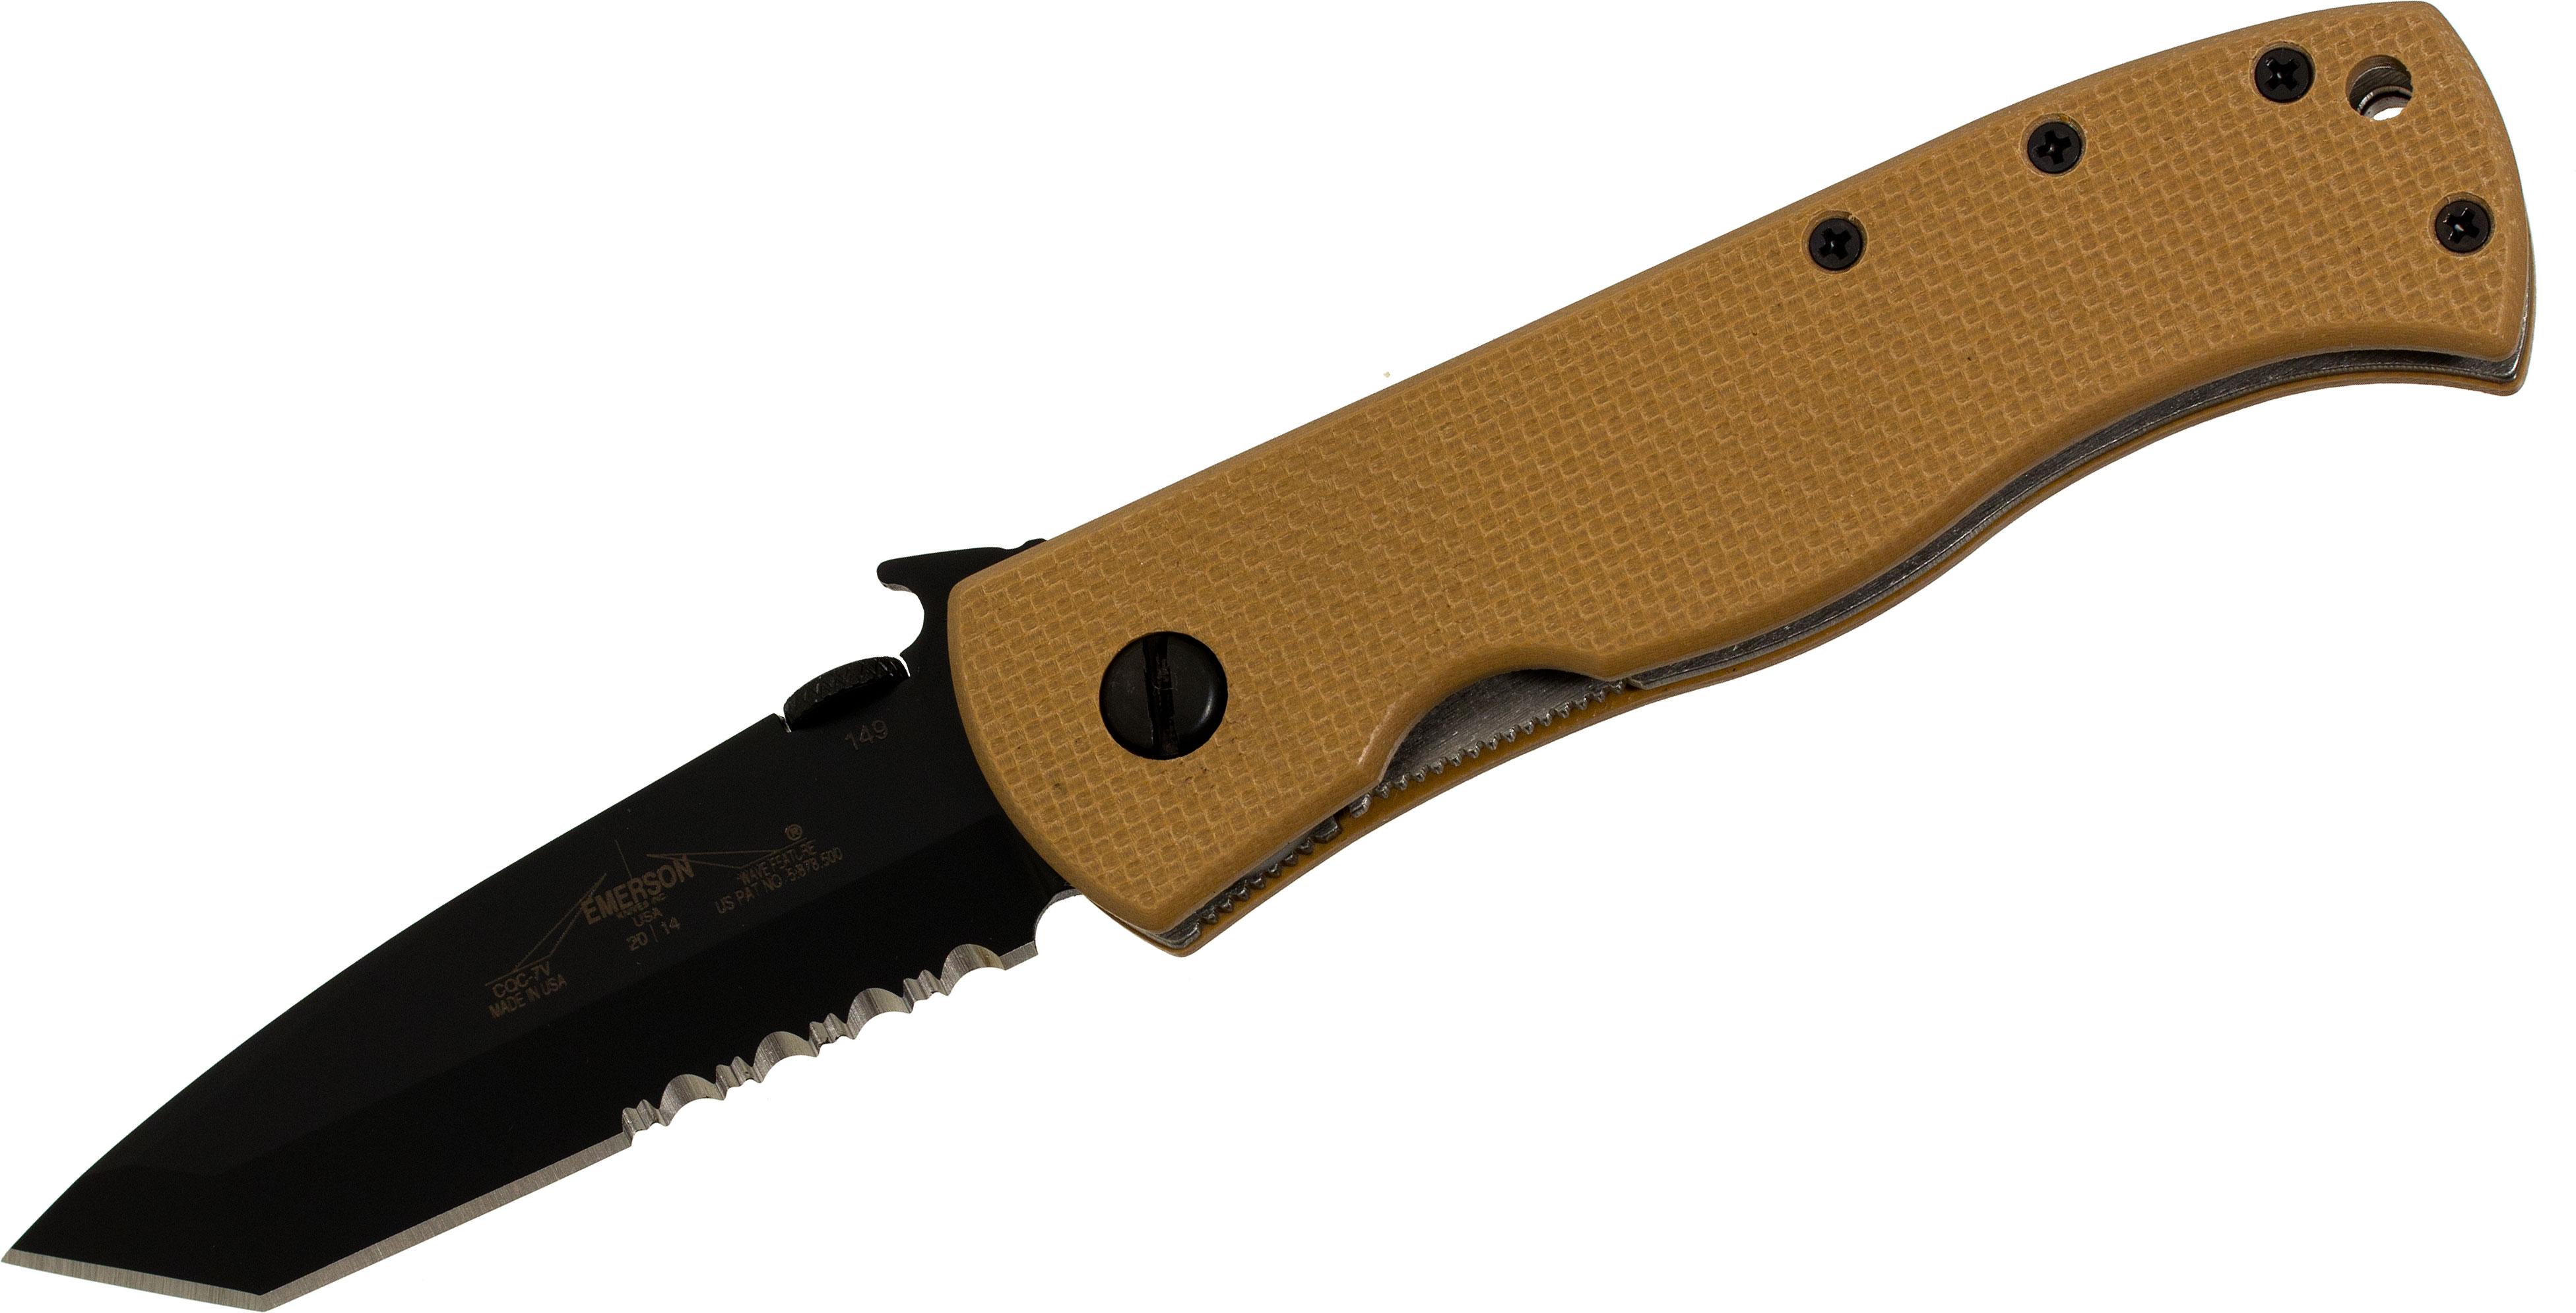 Emerson CQC-7V Folding Knife 3.3 inch Black Tanto Combo Blade, Wave, Afghan Tan G10 Handles